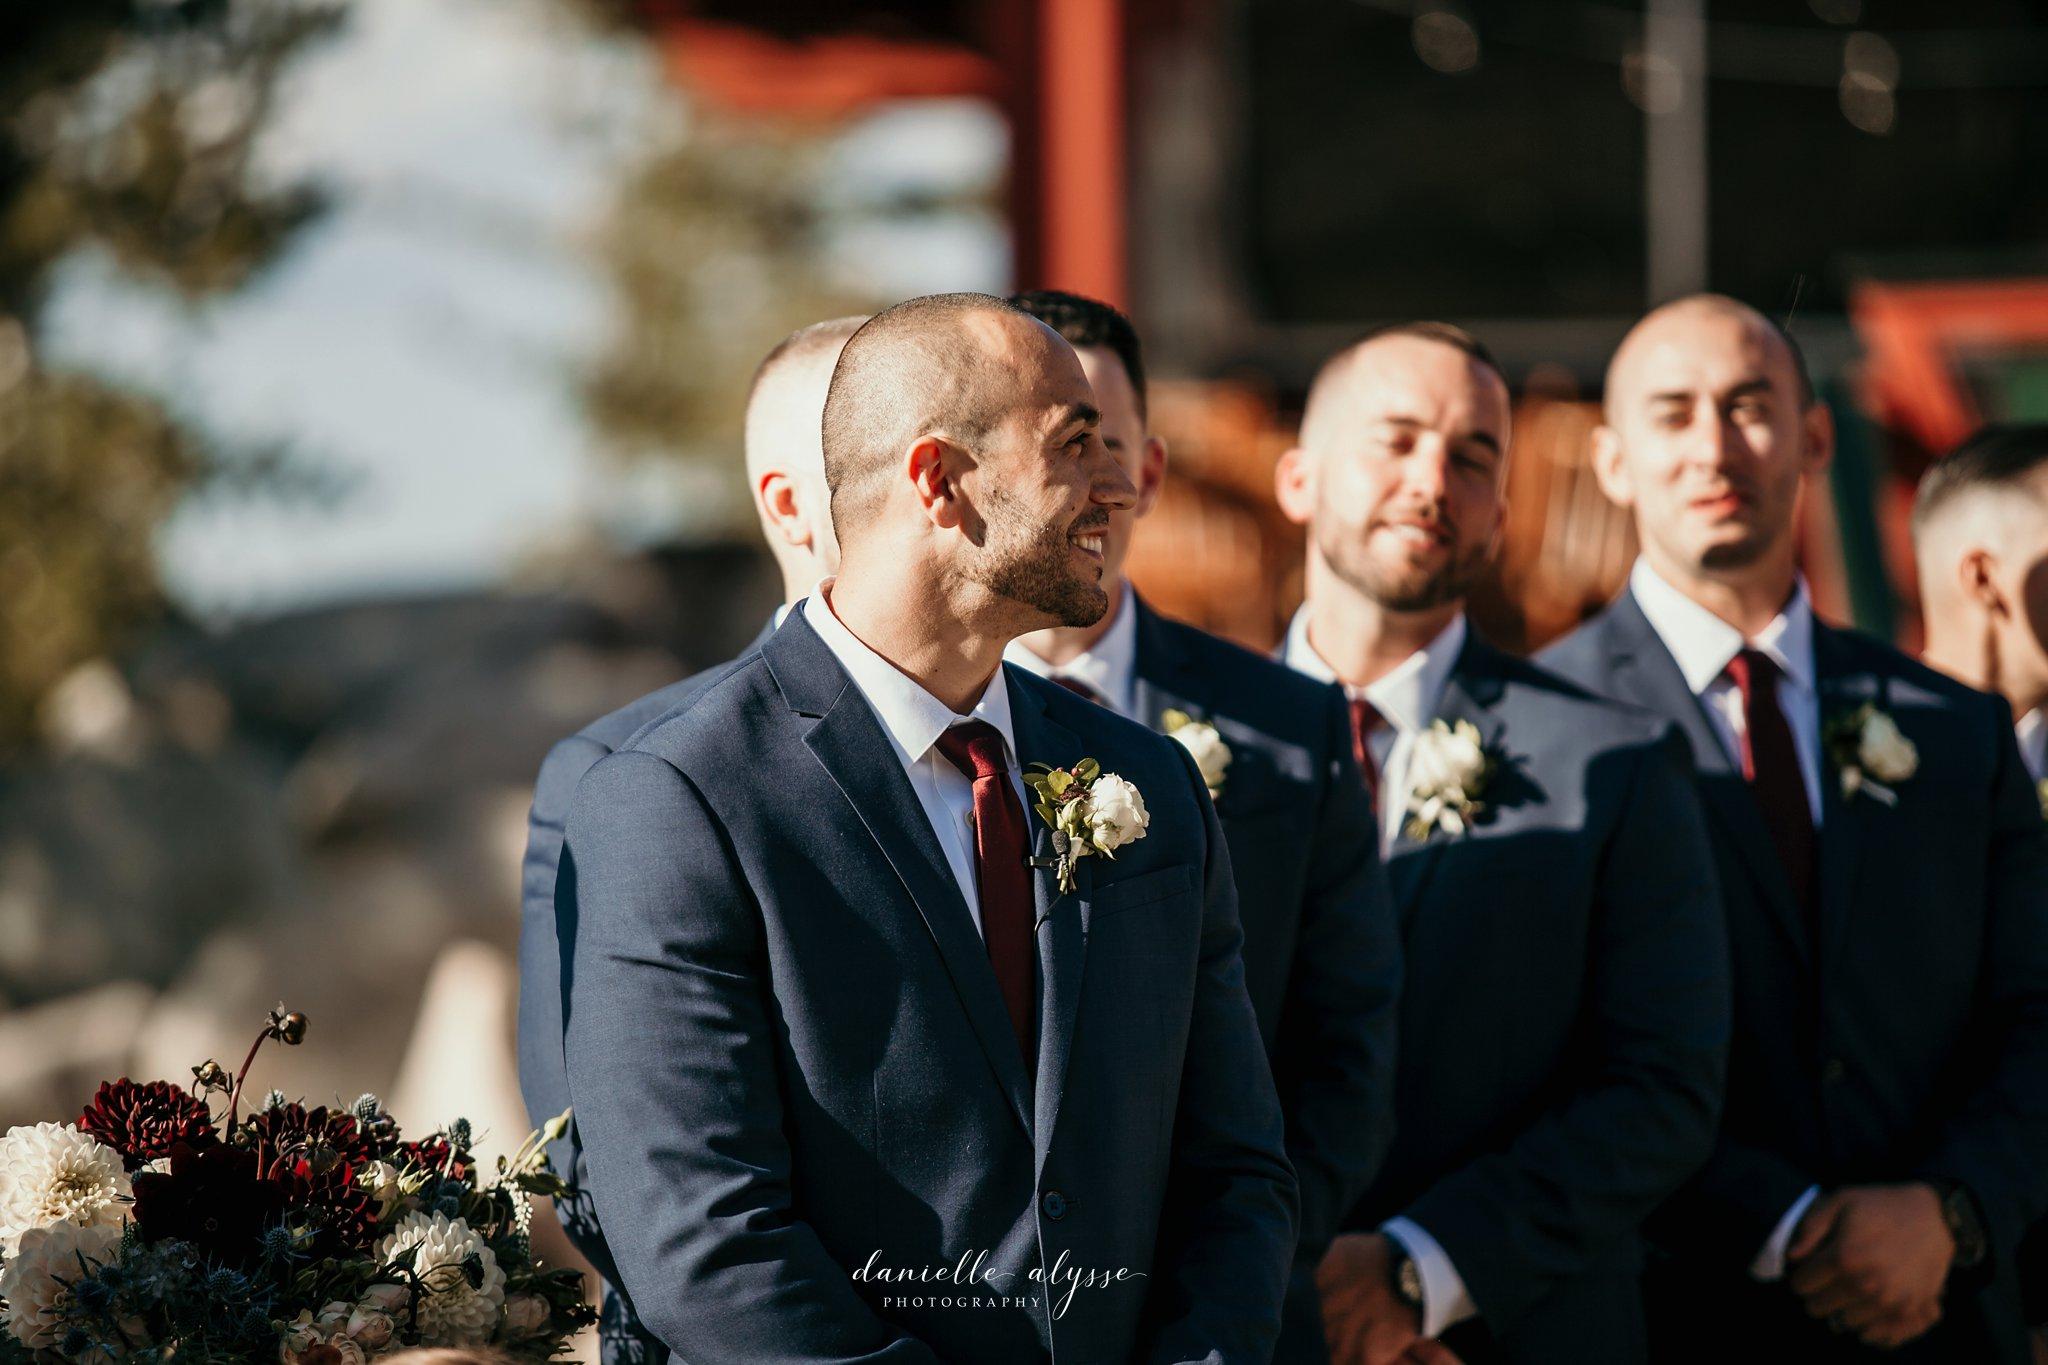 180831_wedding_stephanie_heavenly_south_lake_tahoe_danielle_alysse_photography_destination_blog_631_WEB.jpg